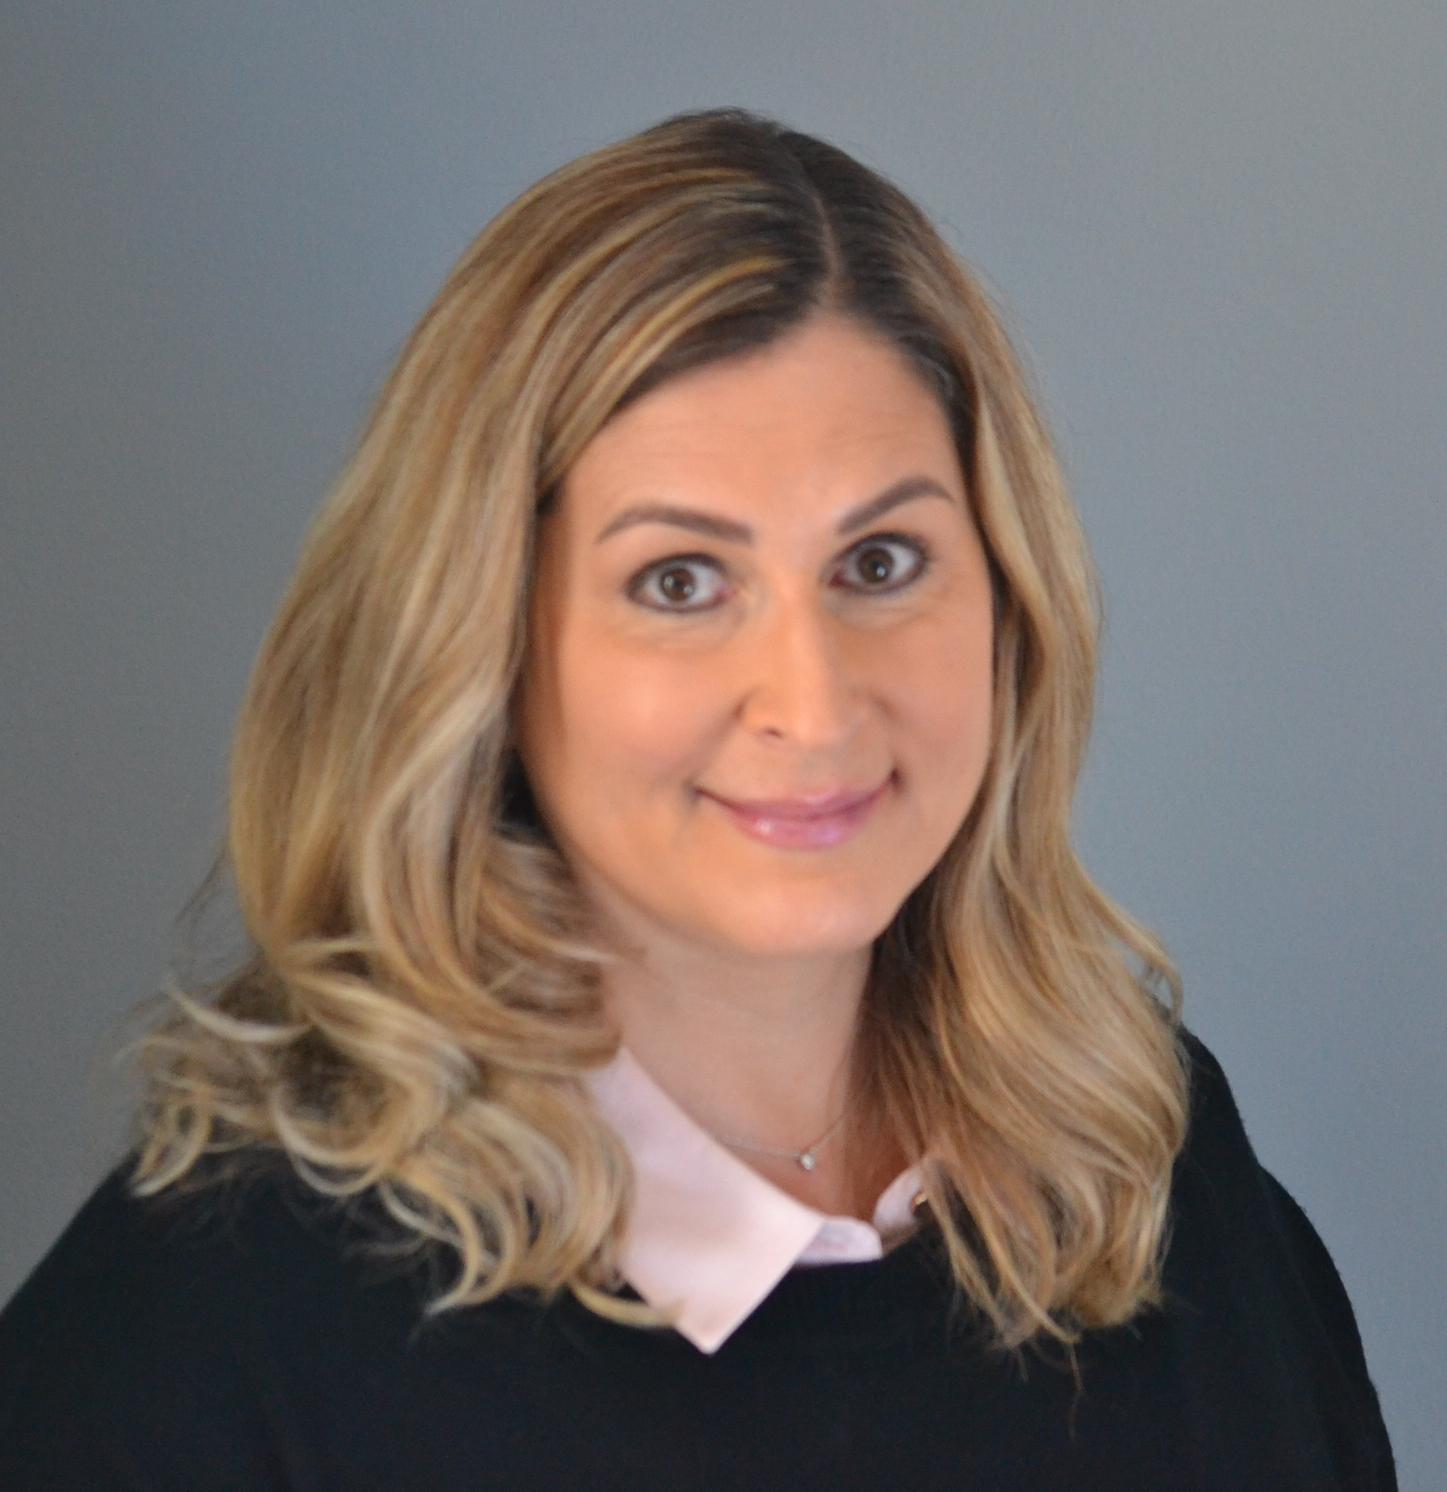 Lara Underhill Calgary Realtor and Calgary Real estate agent